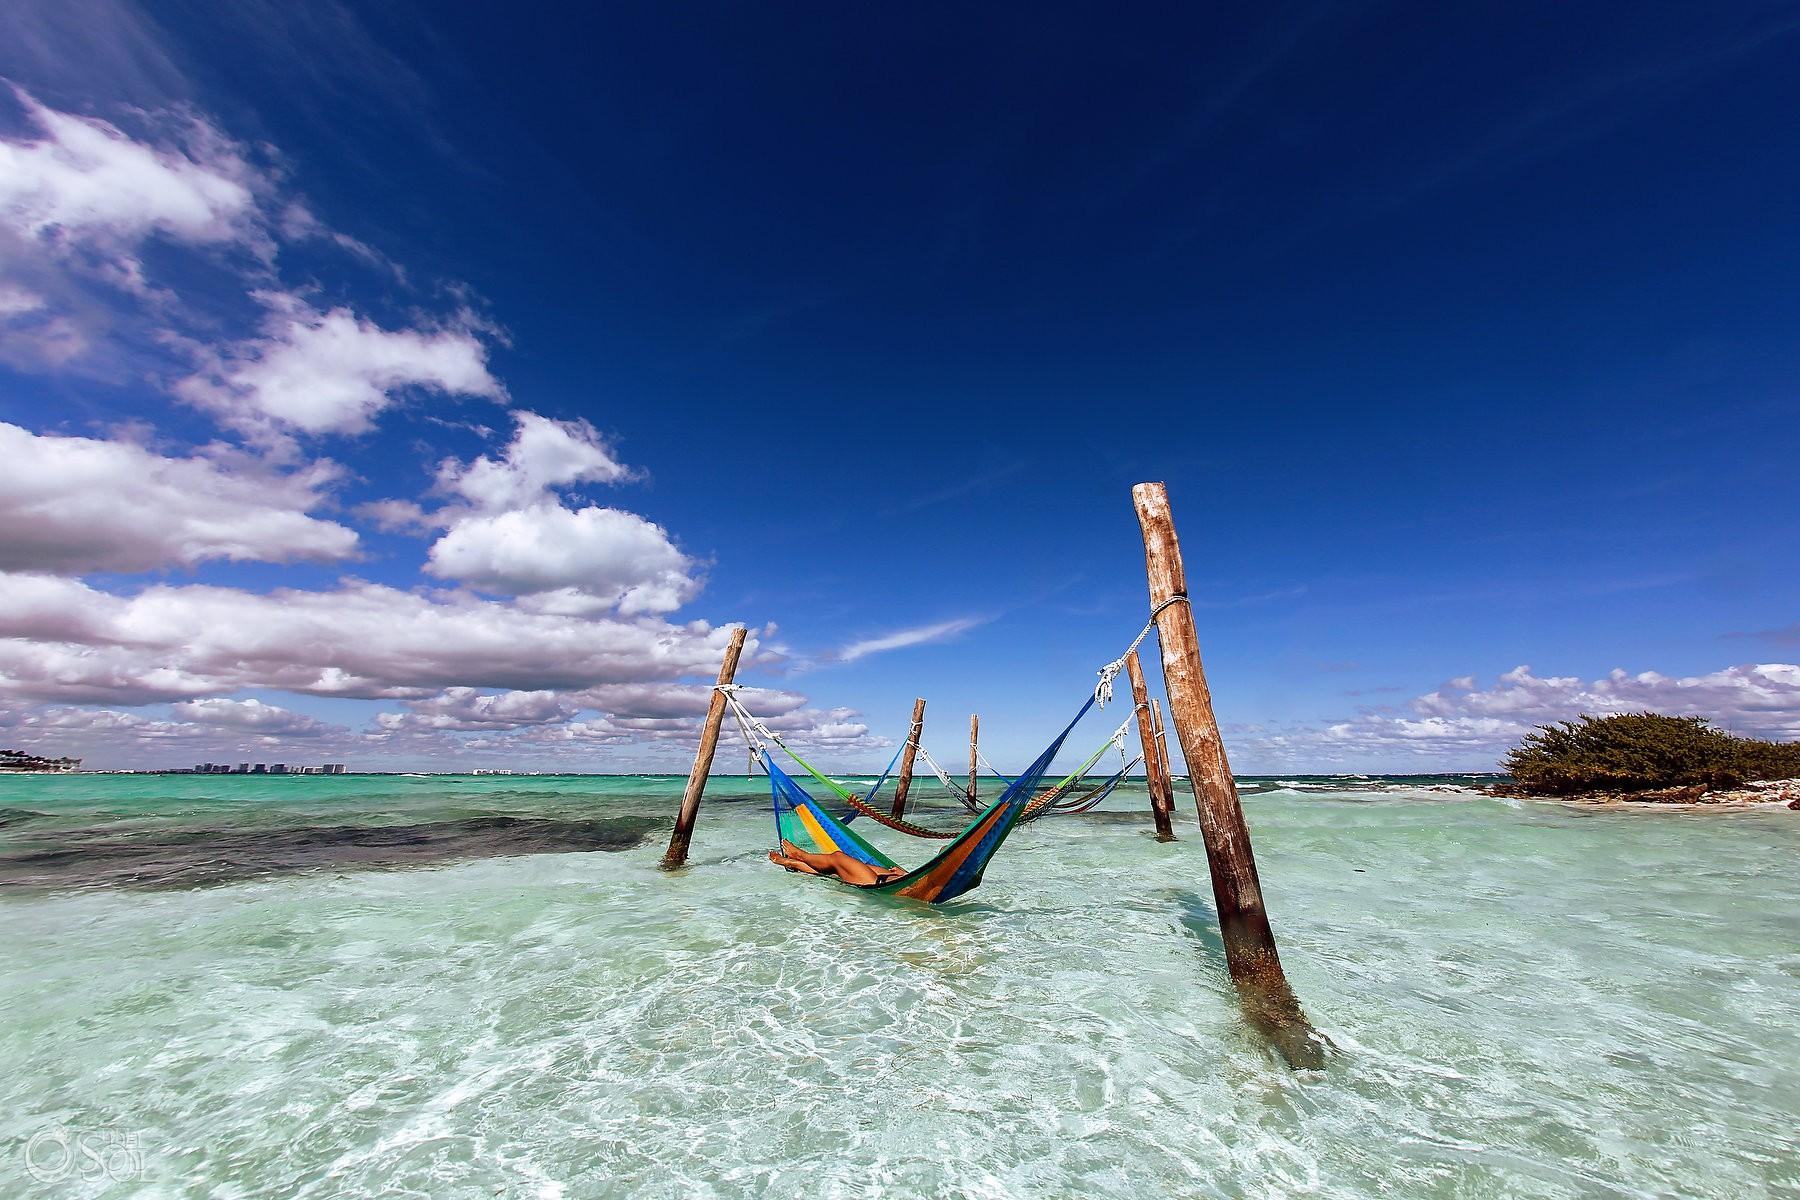 lounging in hammocks at Hyatt Ziva Cancun amazing caribbean turquoise waters